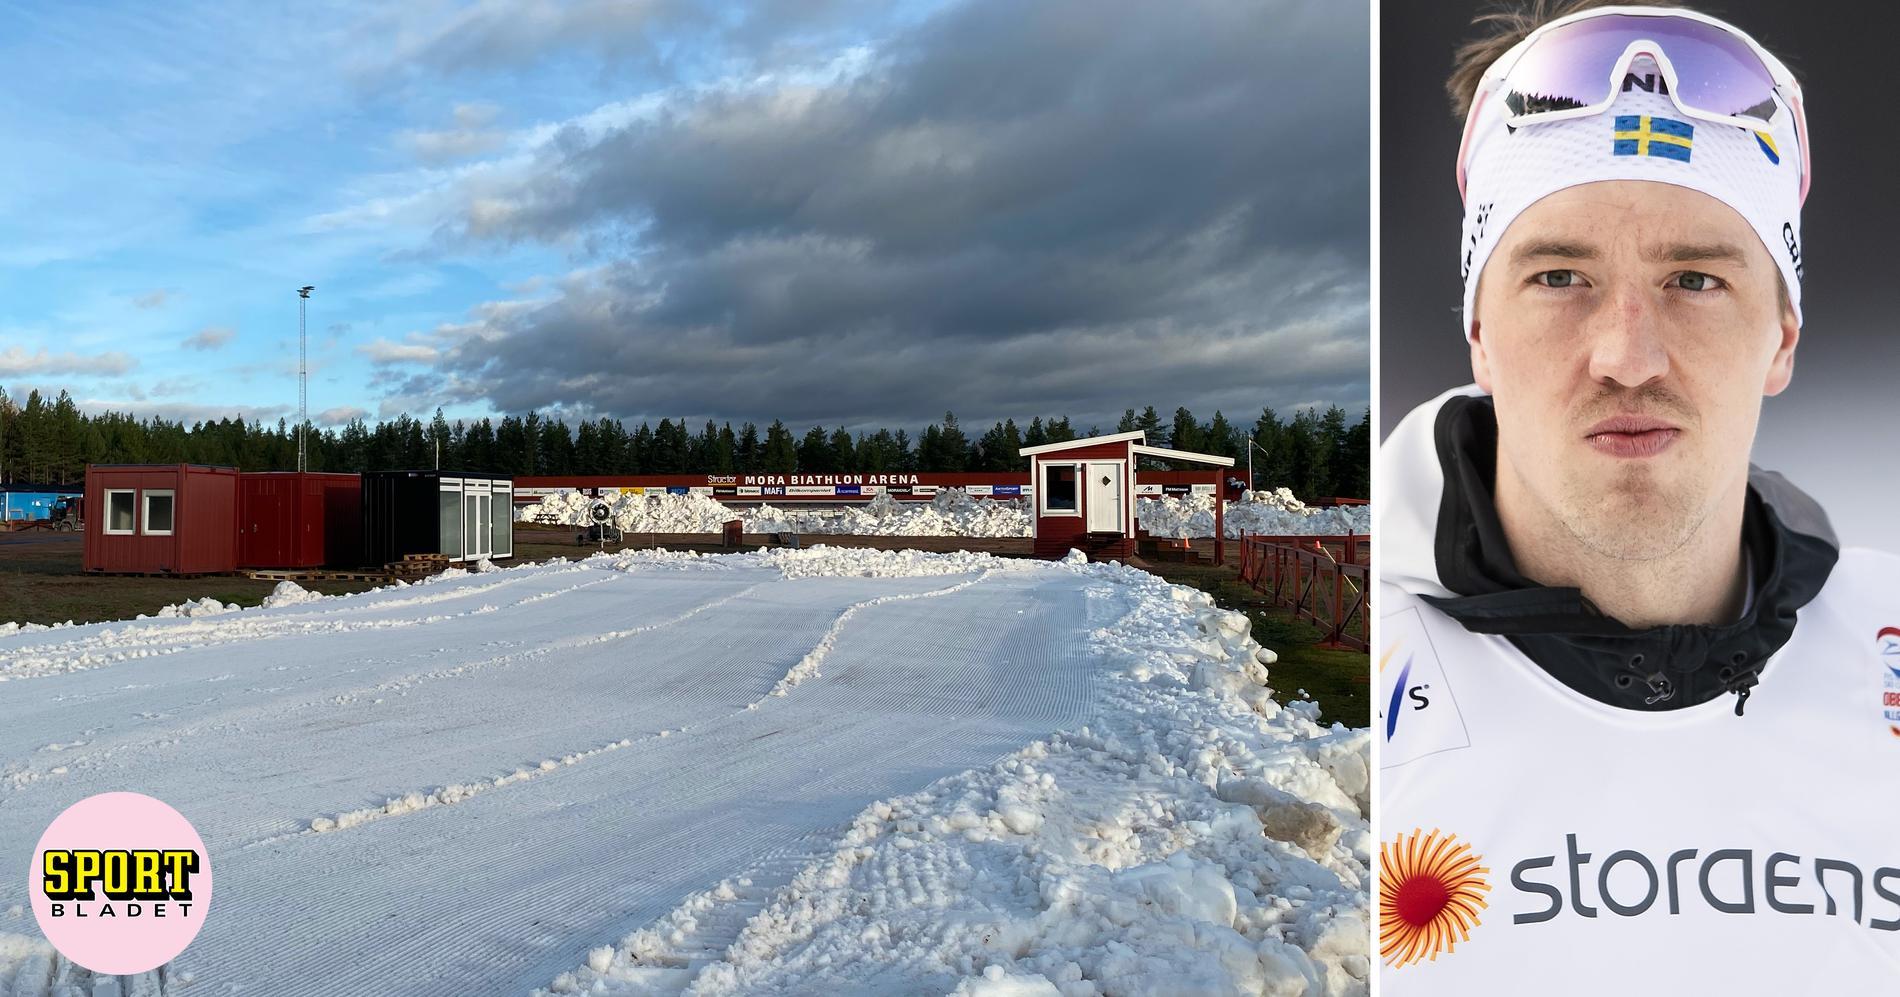 Sportbladet sänder skidfesten i Mora